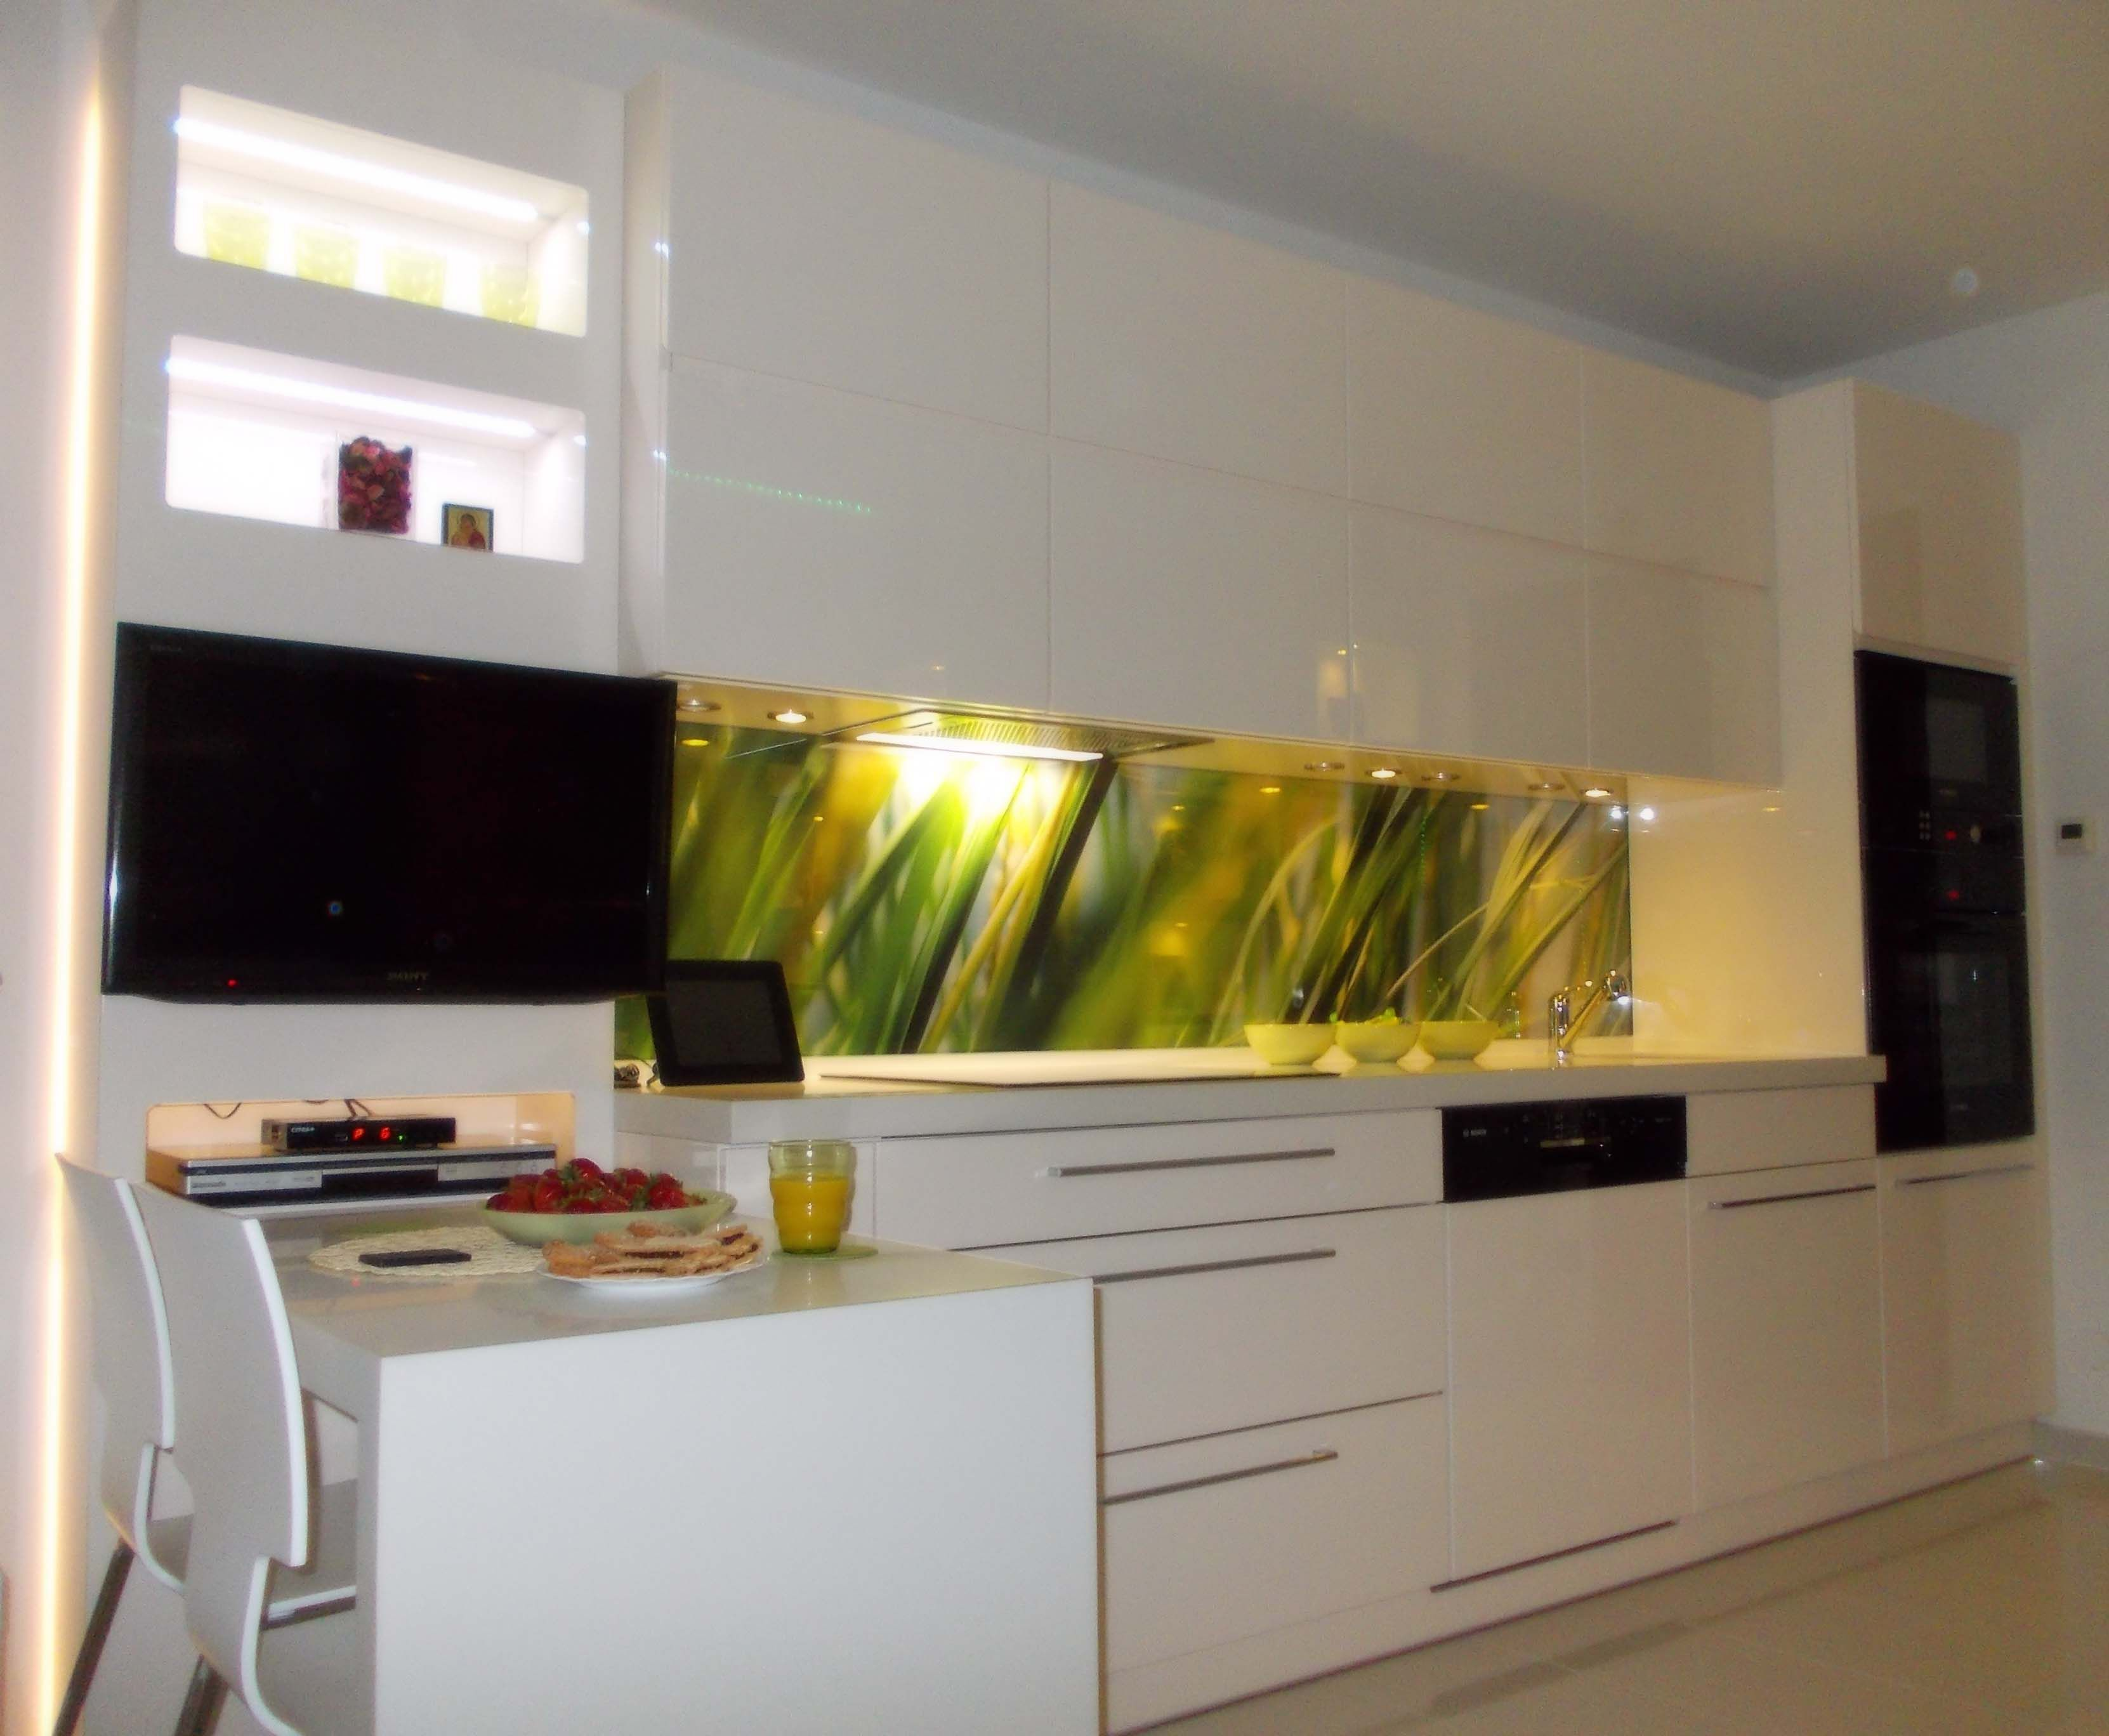 kuchnia przechodnia  Interior design  Pinterest  Interior -> Kuchnia Biala Matowa Z Drewnem